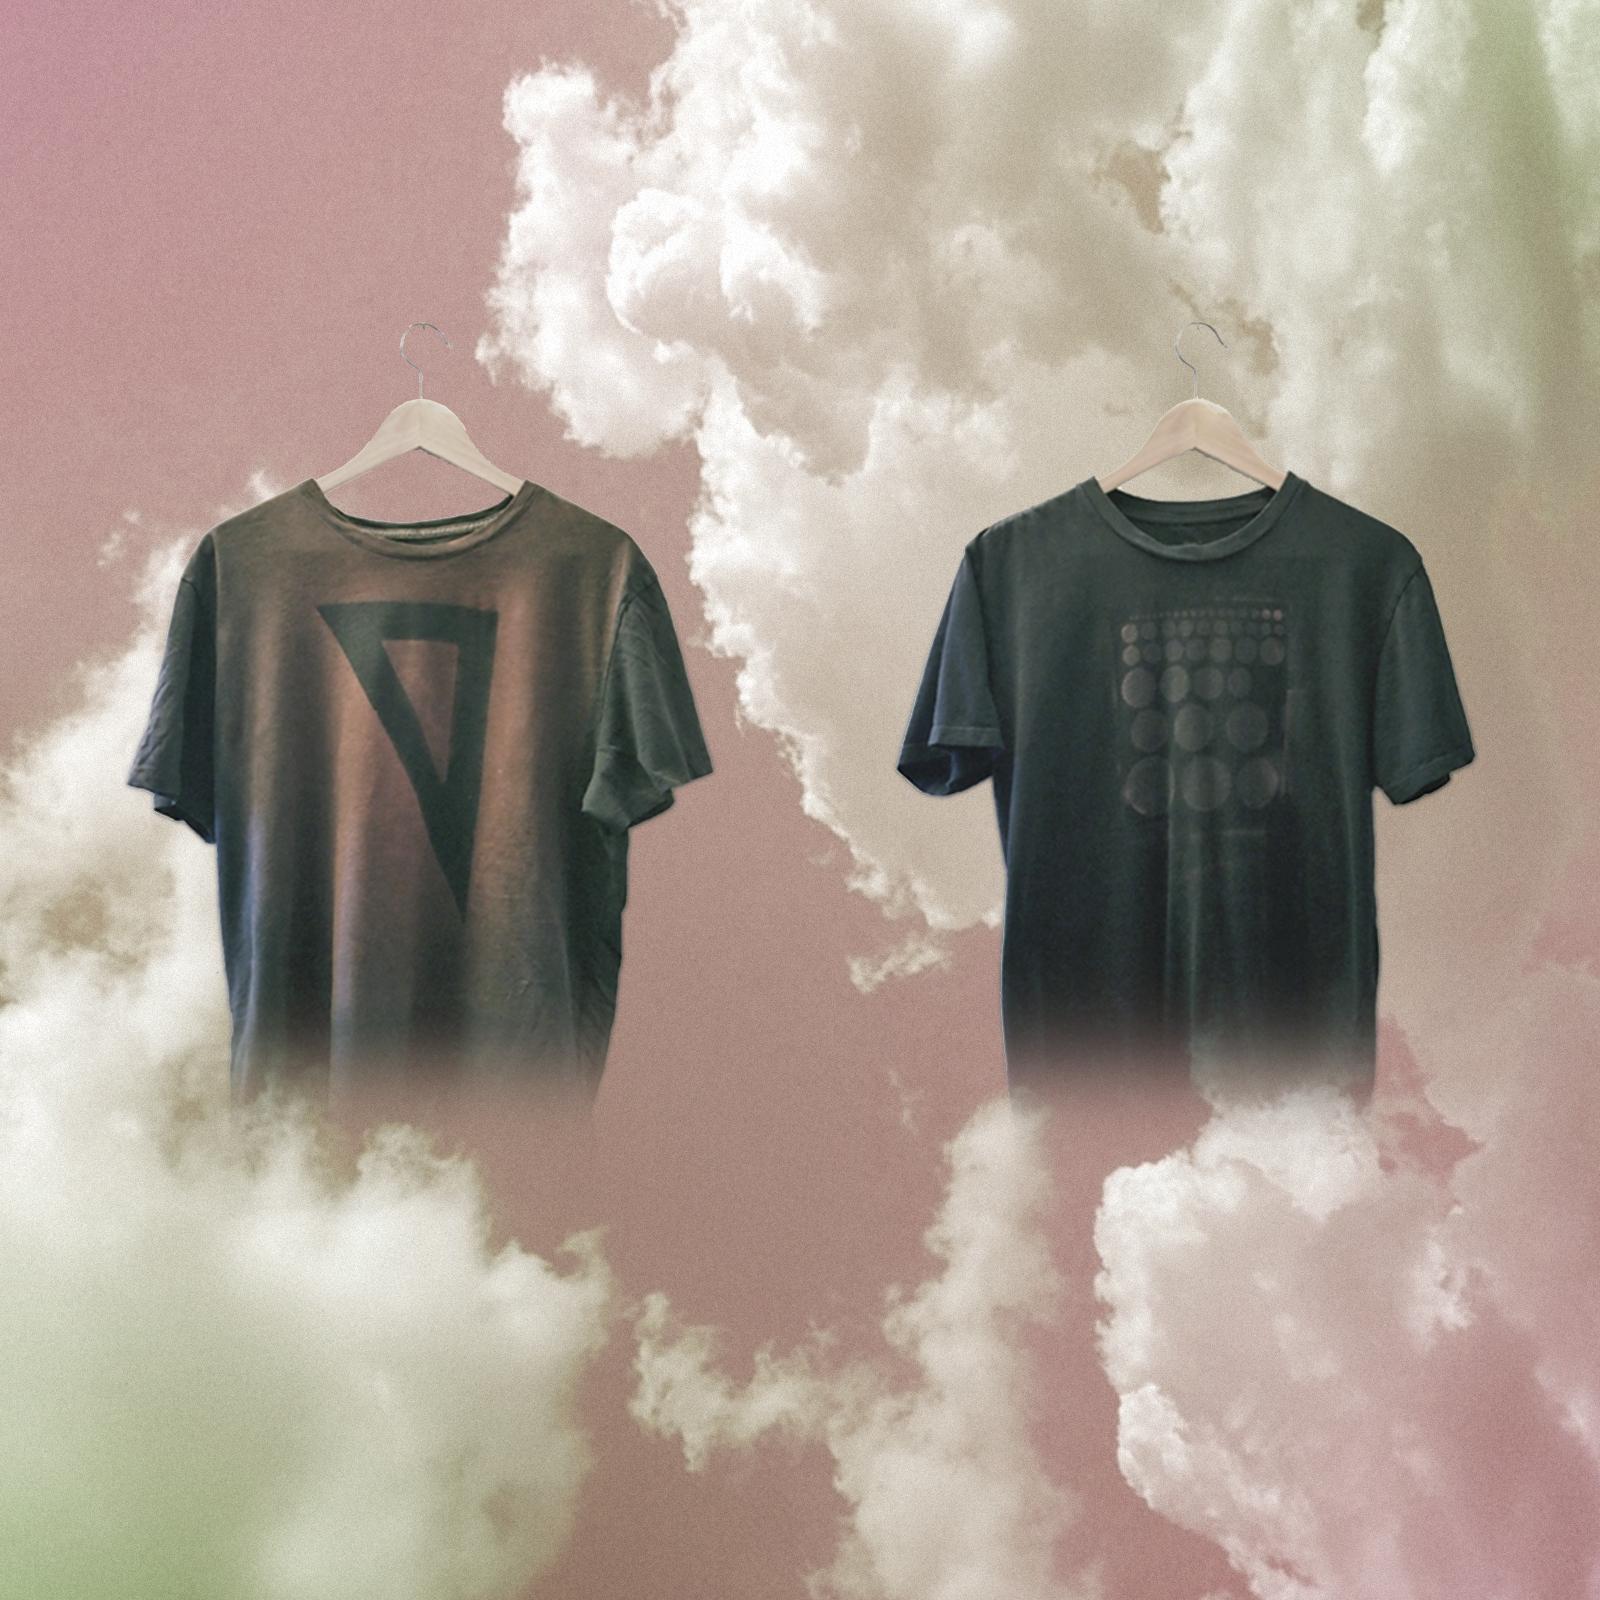 ben_tieni___shirts_1